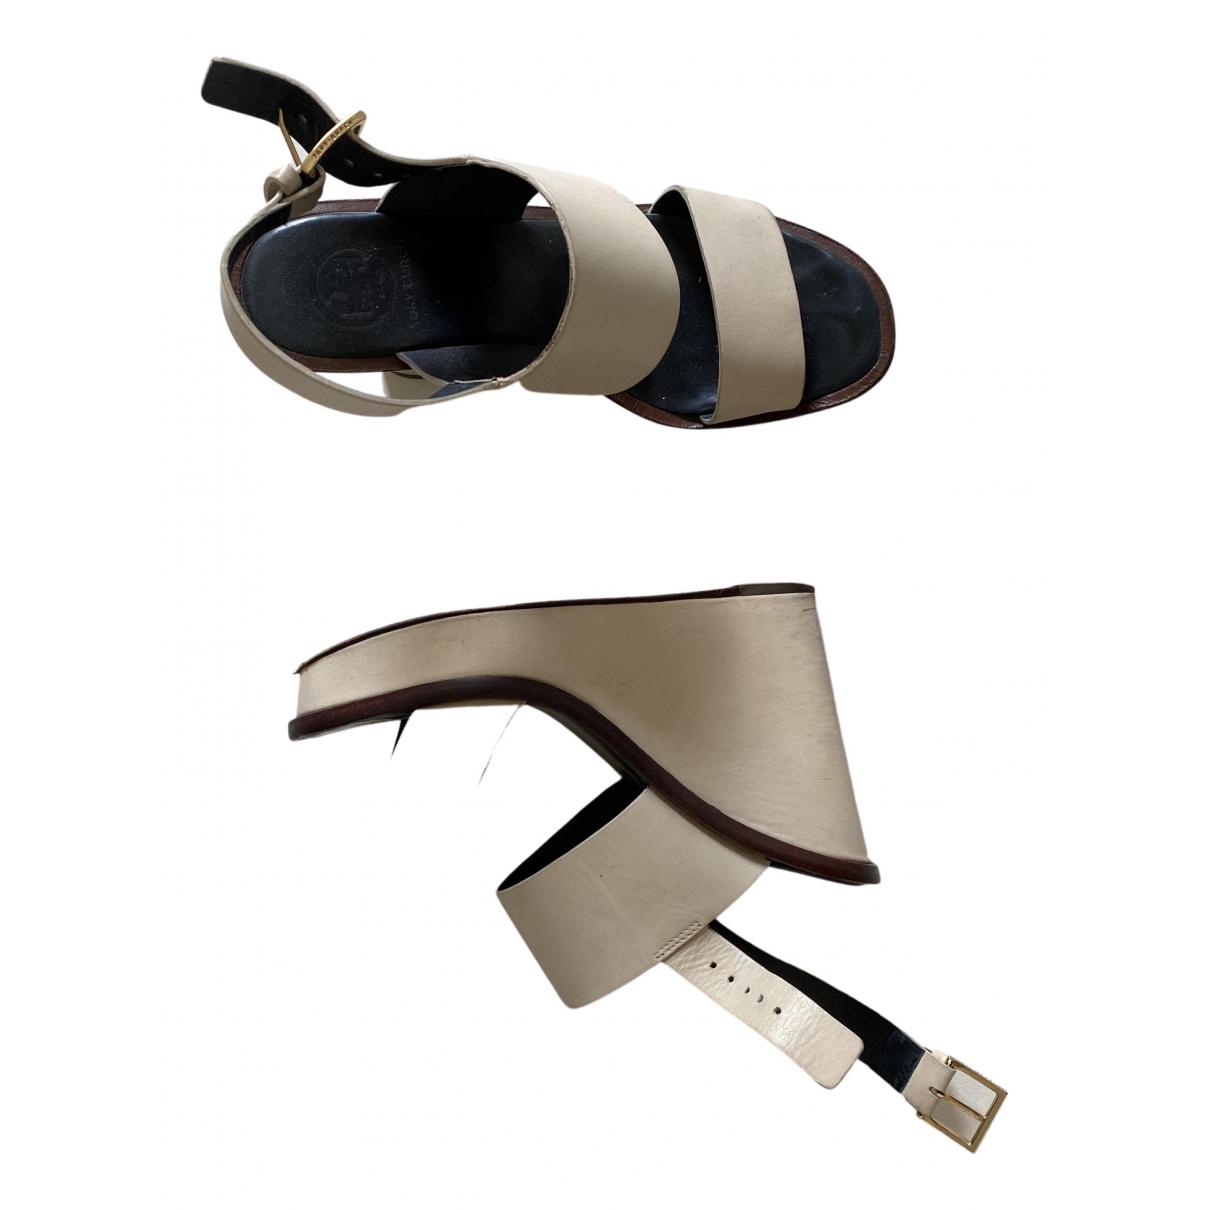 Tory Burch N Ecru Leather Sandals for Women 36 EU